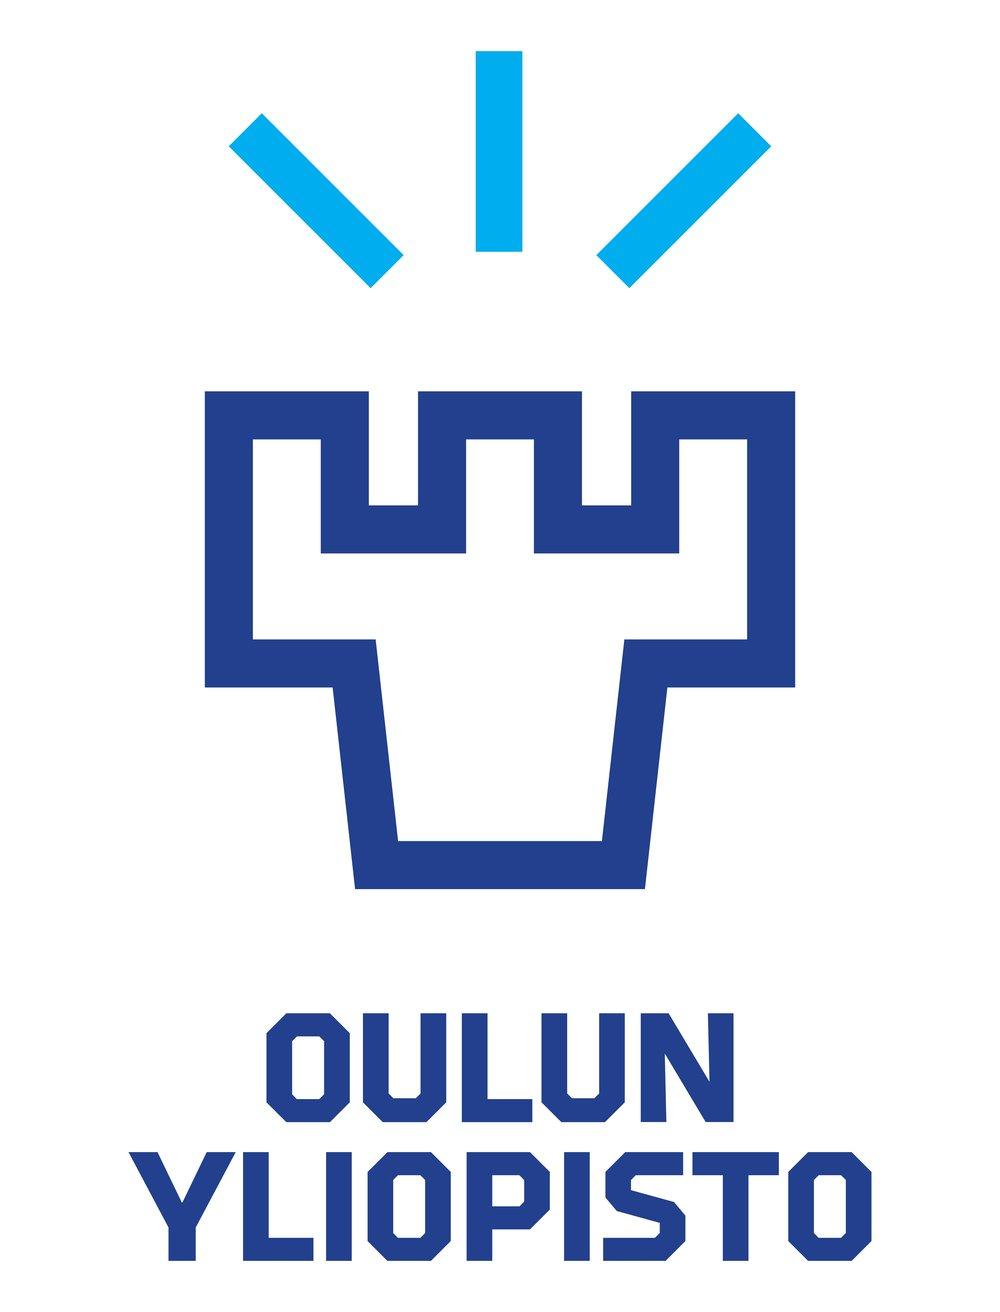 oulun yliopisto_logo_fin_rgb10.jpg